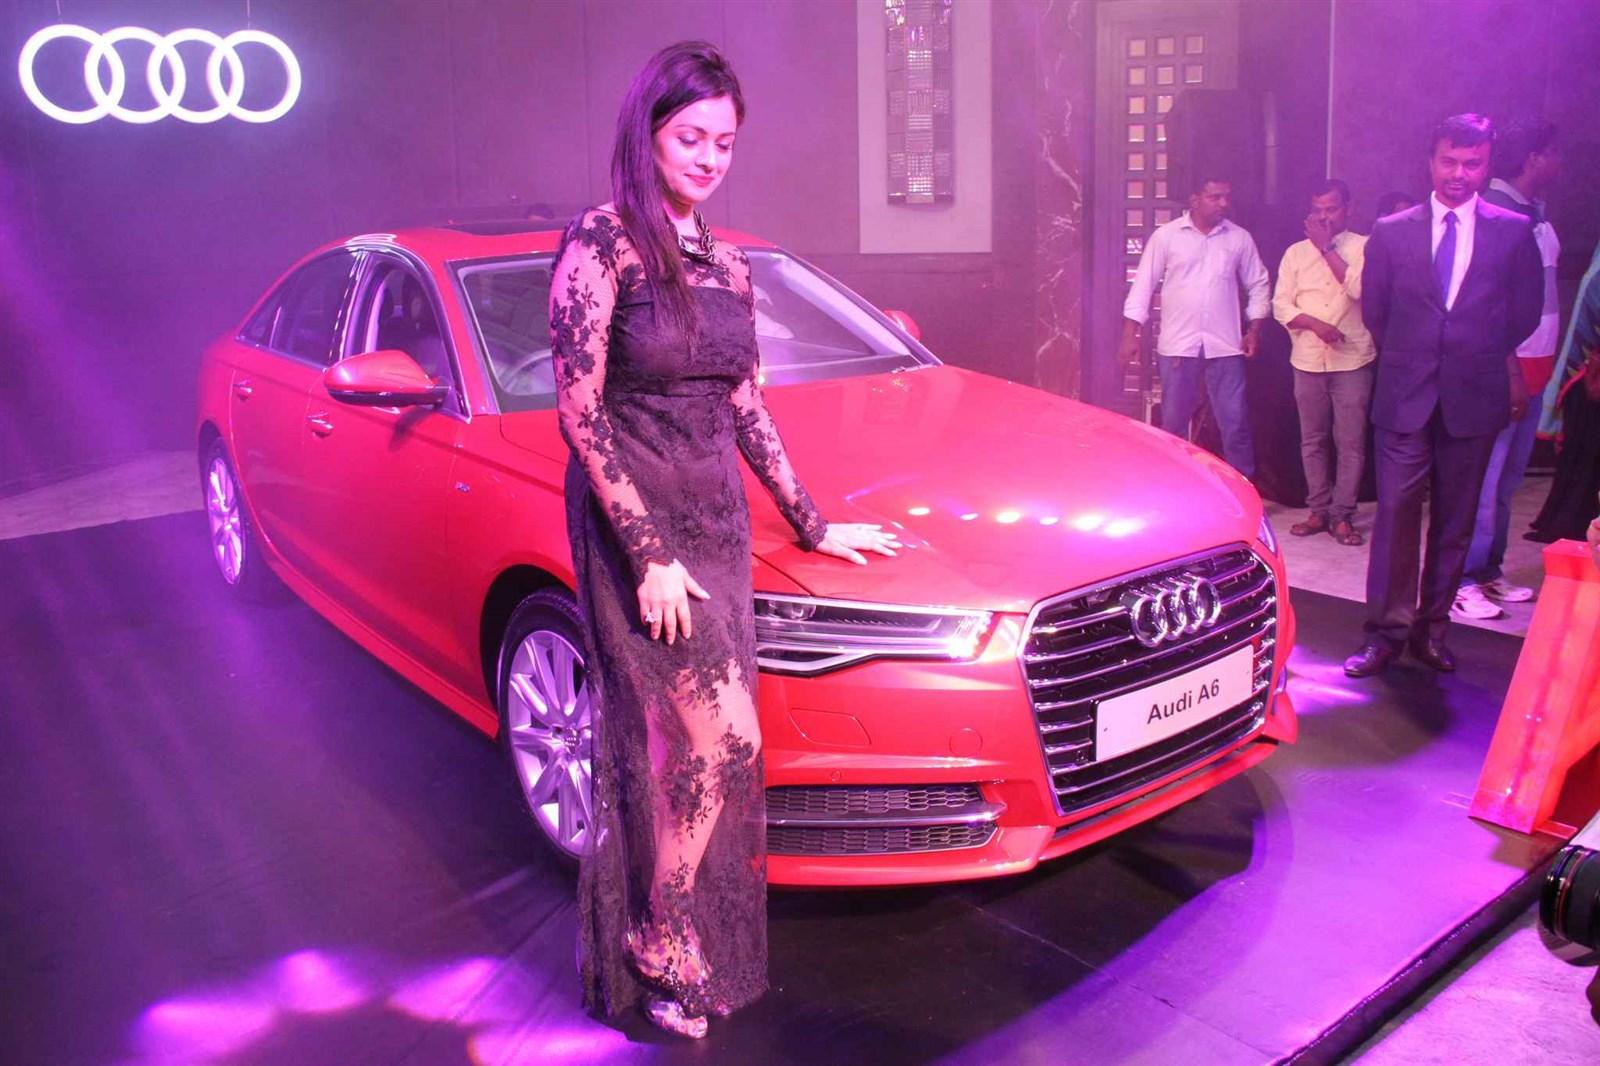 new car launches audiPicture 927477  Audi A6 Matrix Car Launch by Actress Pooja Kumar